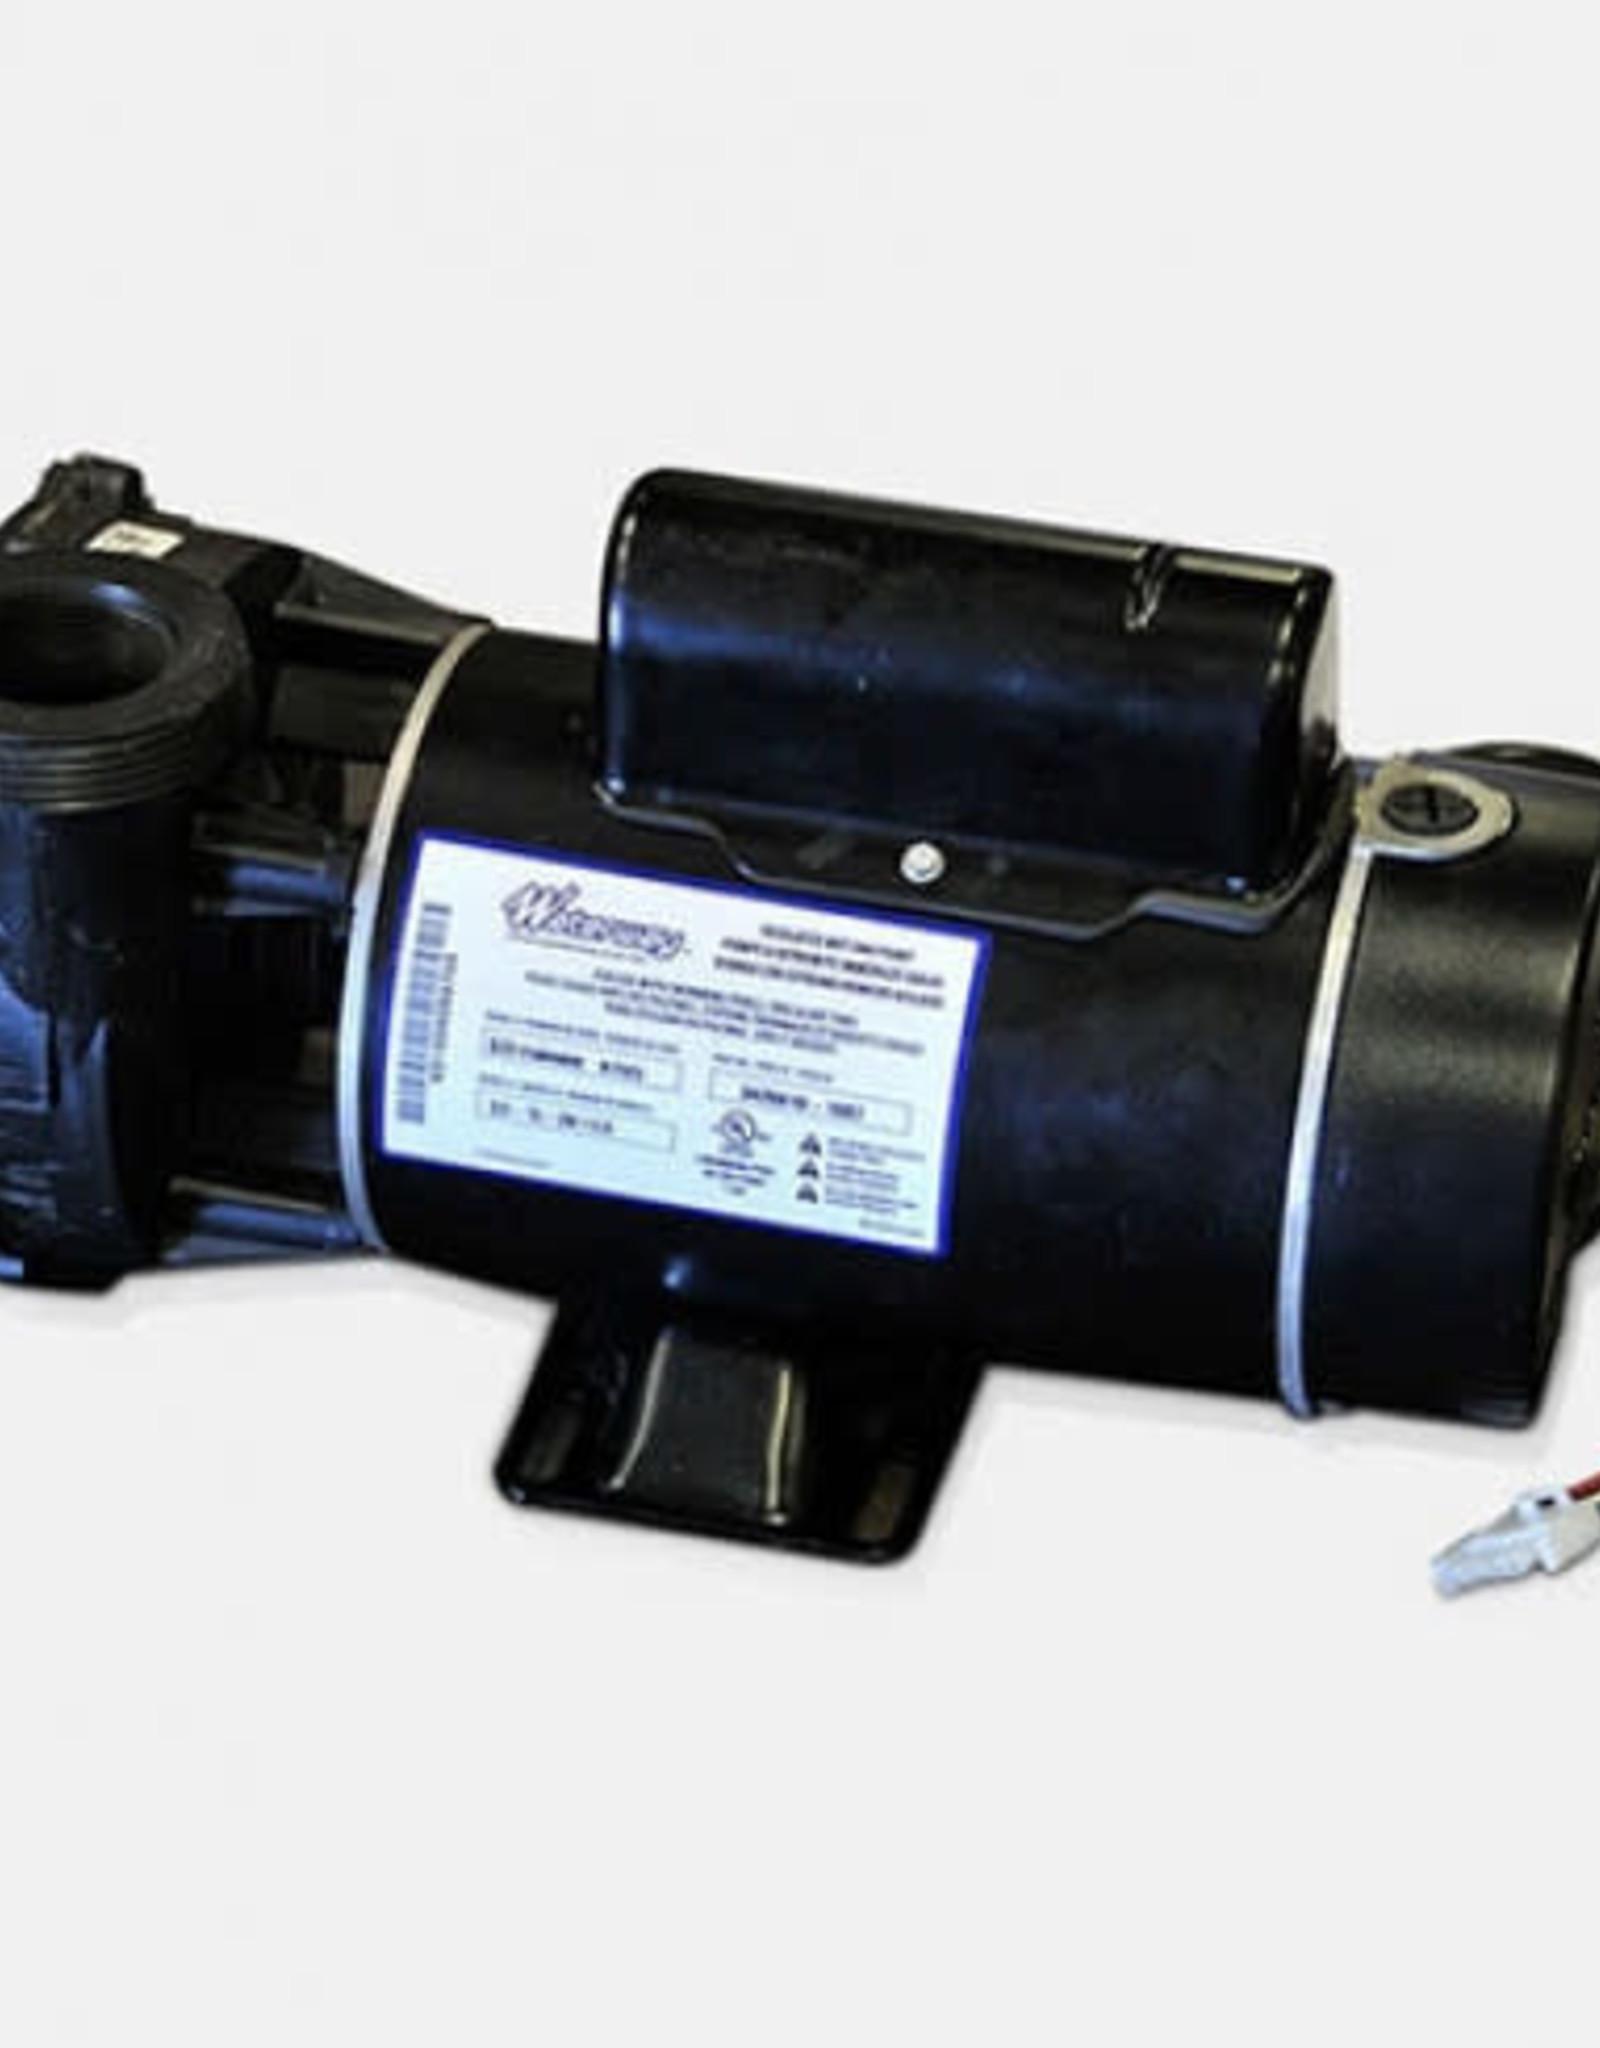 BEACHCOMBER BEACHCOMBER 1.5HP 2SP 110V 48F 2.0 X 2.0